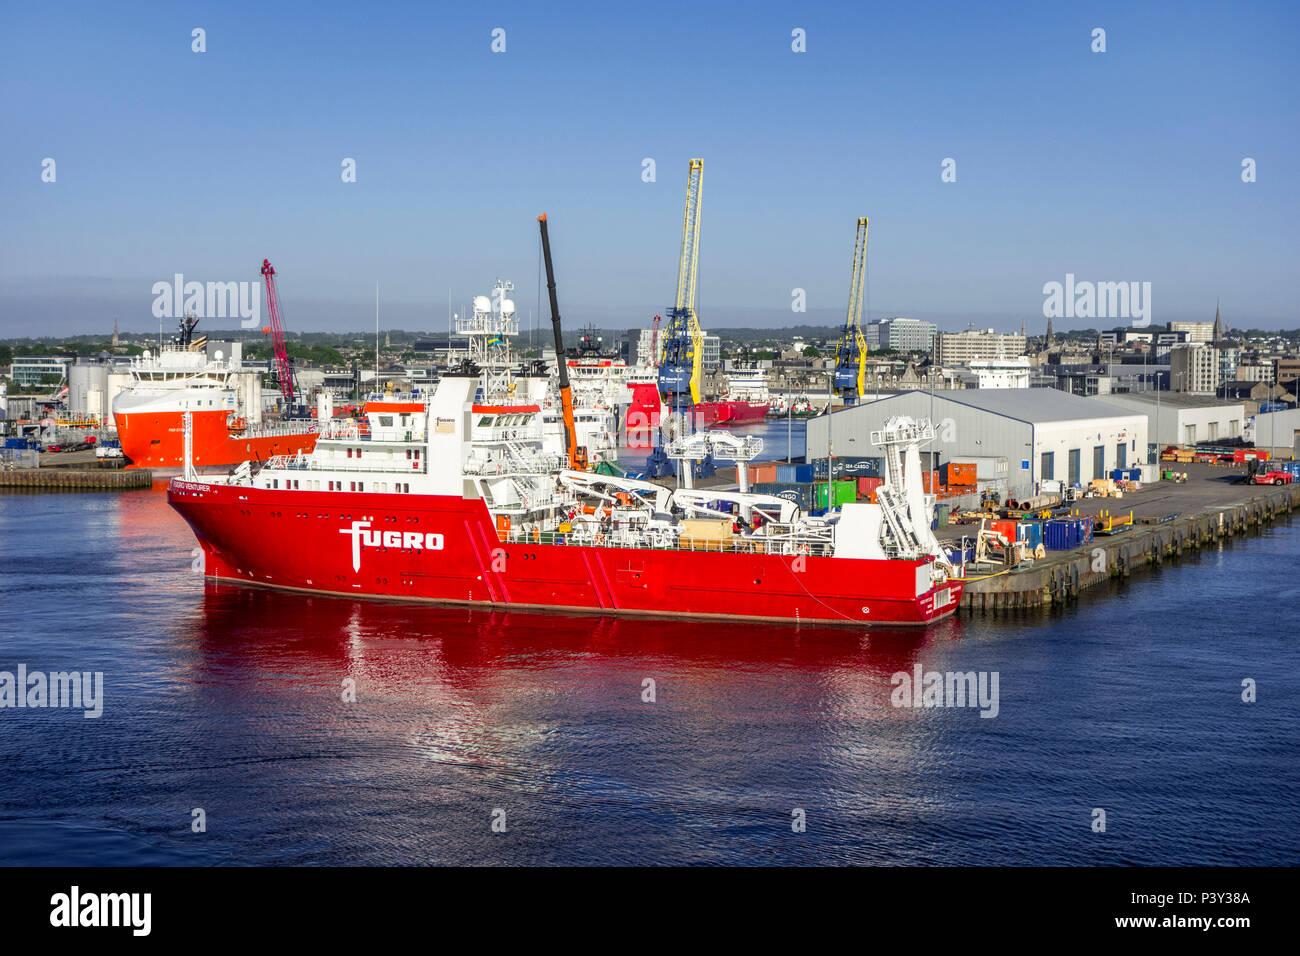 Fugro Venturer, geophysical & hydrographic survey vessel docked in the Aberdeen port, Aberdeenshire, Scotland, UK - Stock Image